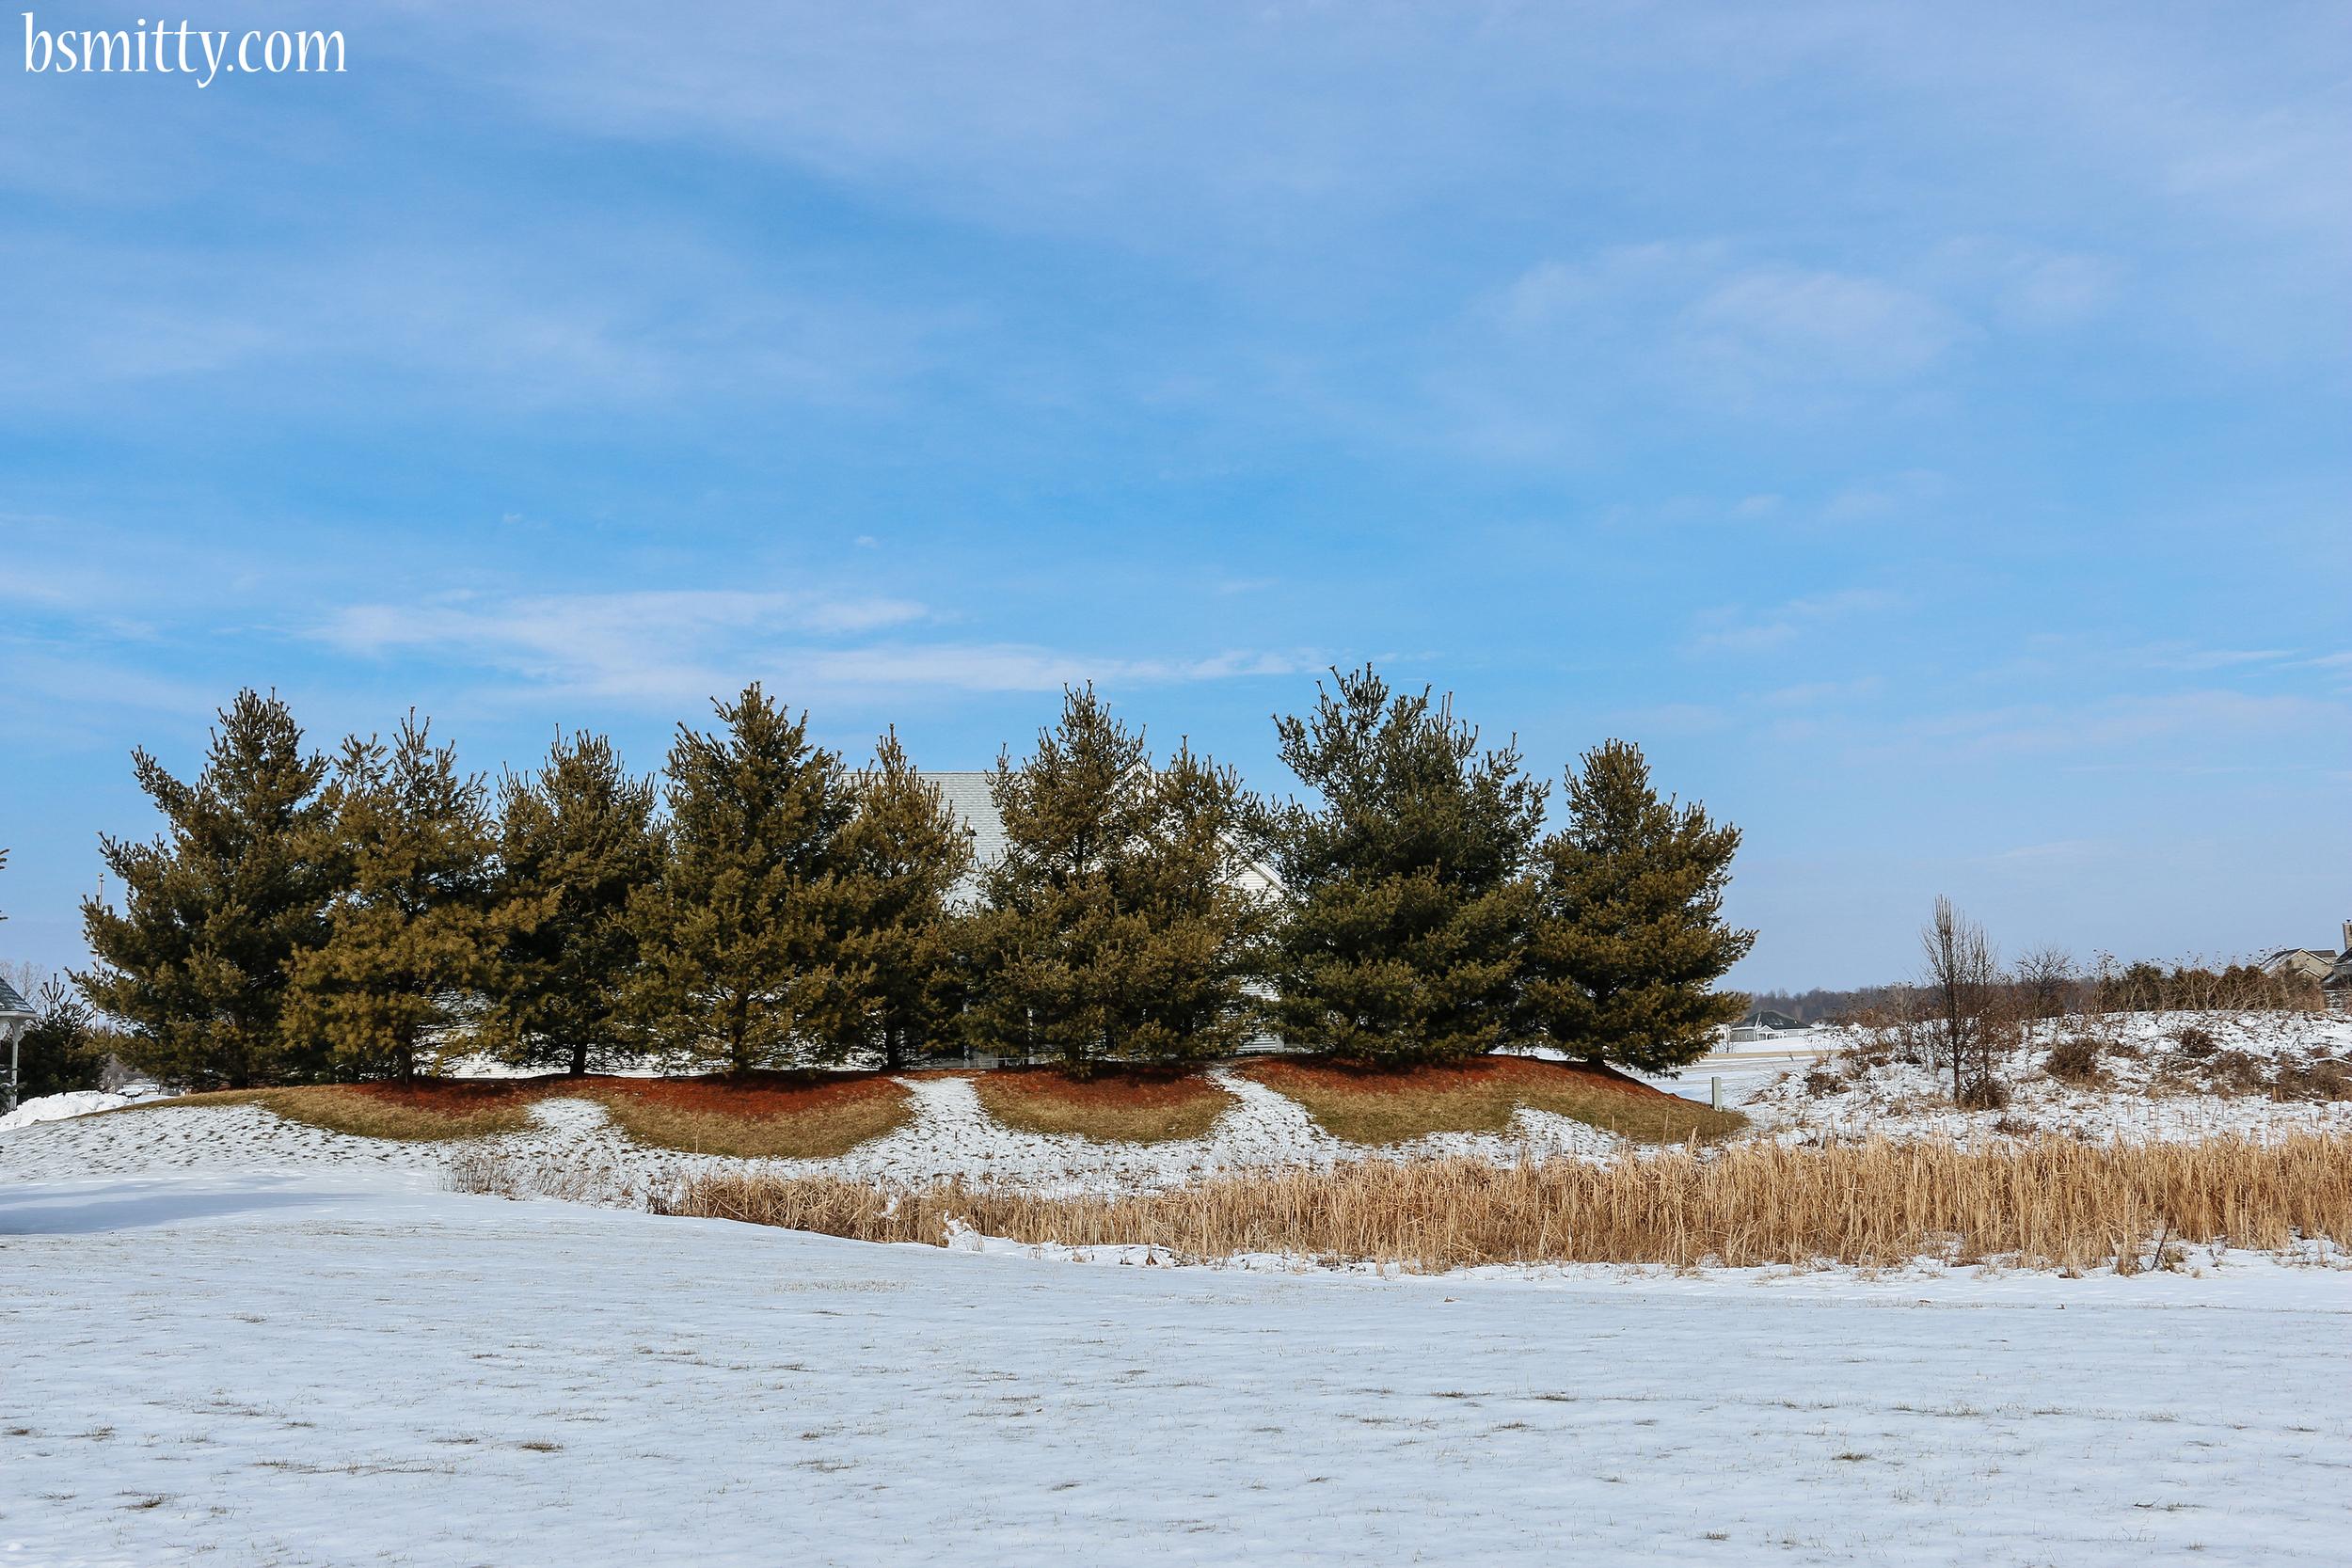 line of trees - photo bsmitty copy.jpg